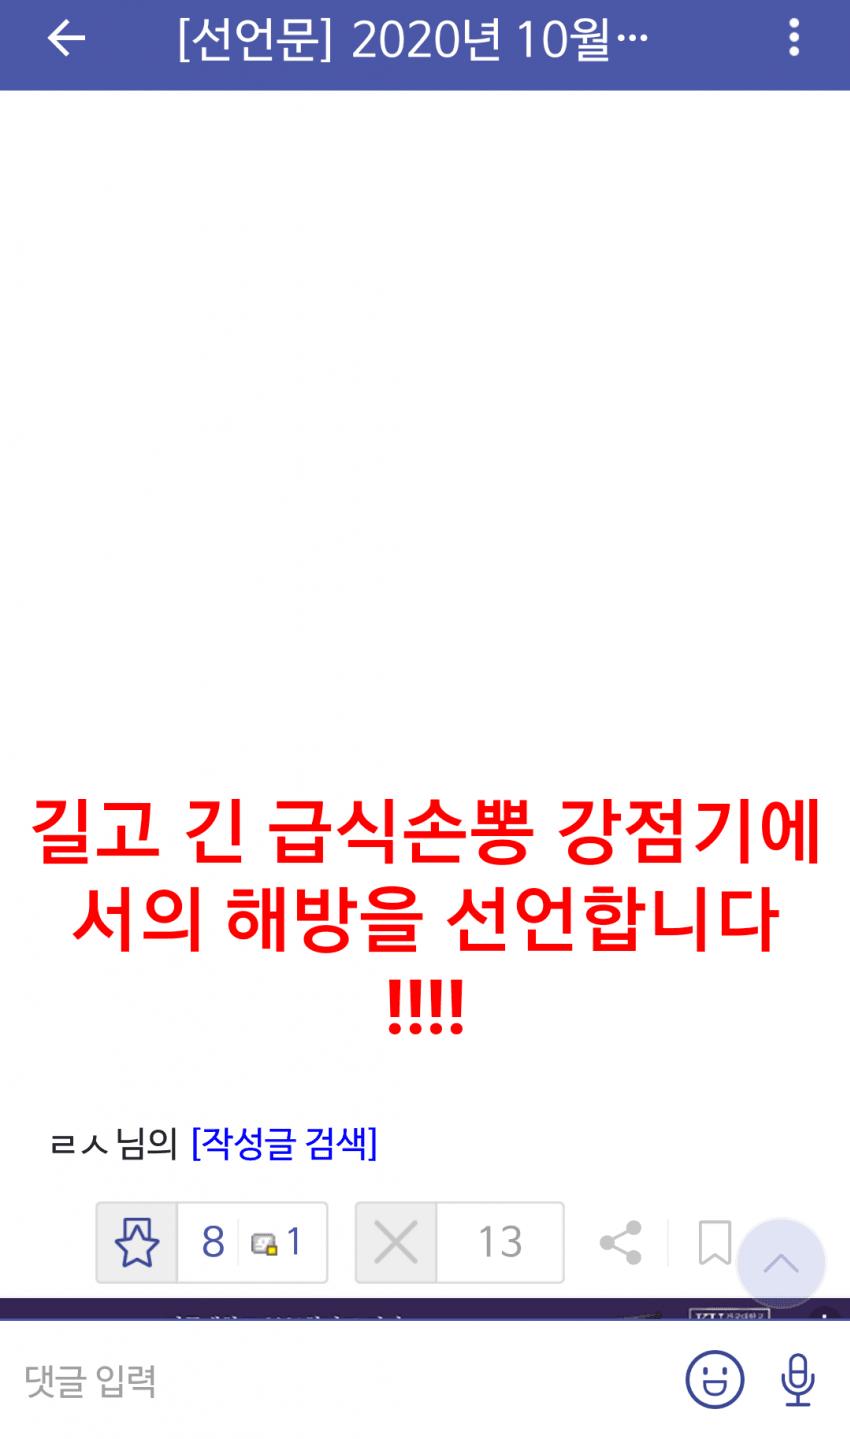 viewimage.php?id=2bb2df32e7d334aa51b1d3a240&no=24b0d769e1d32ca73cec84fa11d028316f6e59db3d00f81430124c7066e8965ce2ecff379490871056f667eedf323652e0b108569530fbcdcf7cc3bbd5b8bdb1ad79bc89ab0b4016ee4b03905d001acedd0ec1349d1e848a